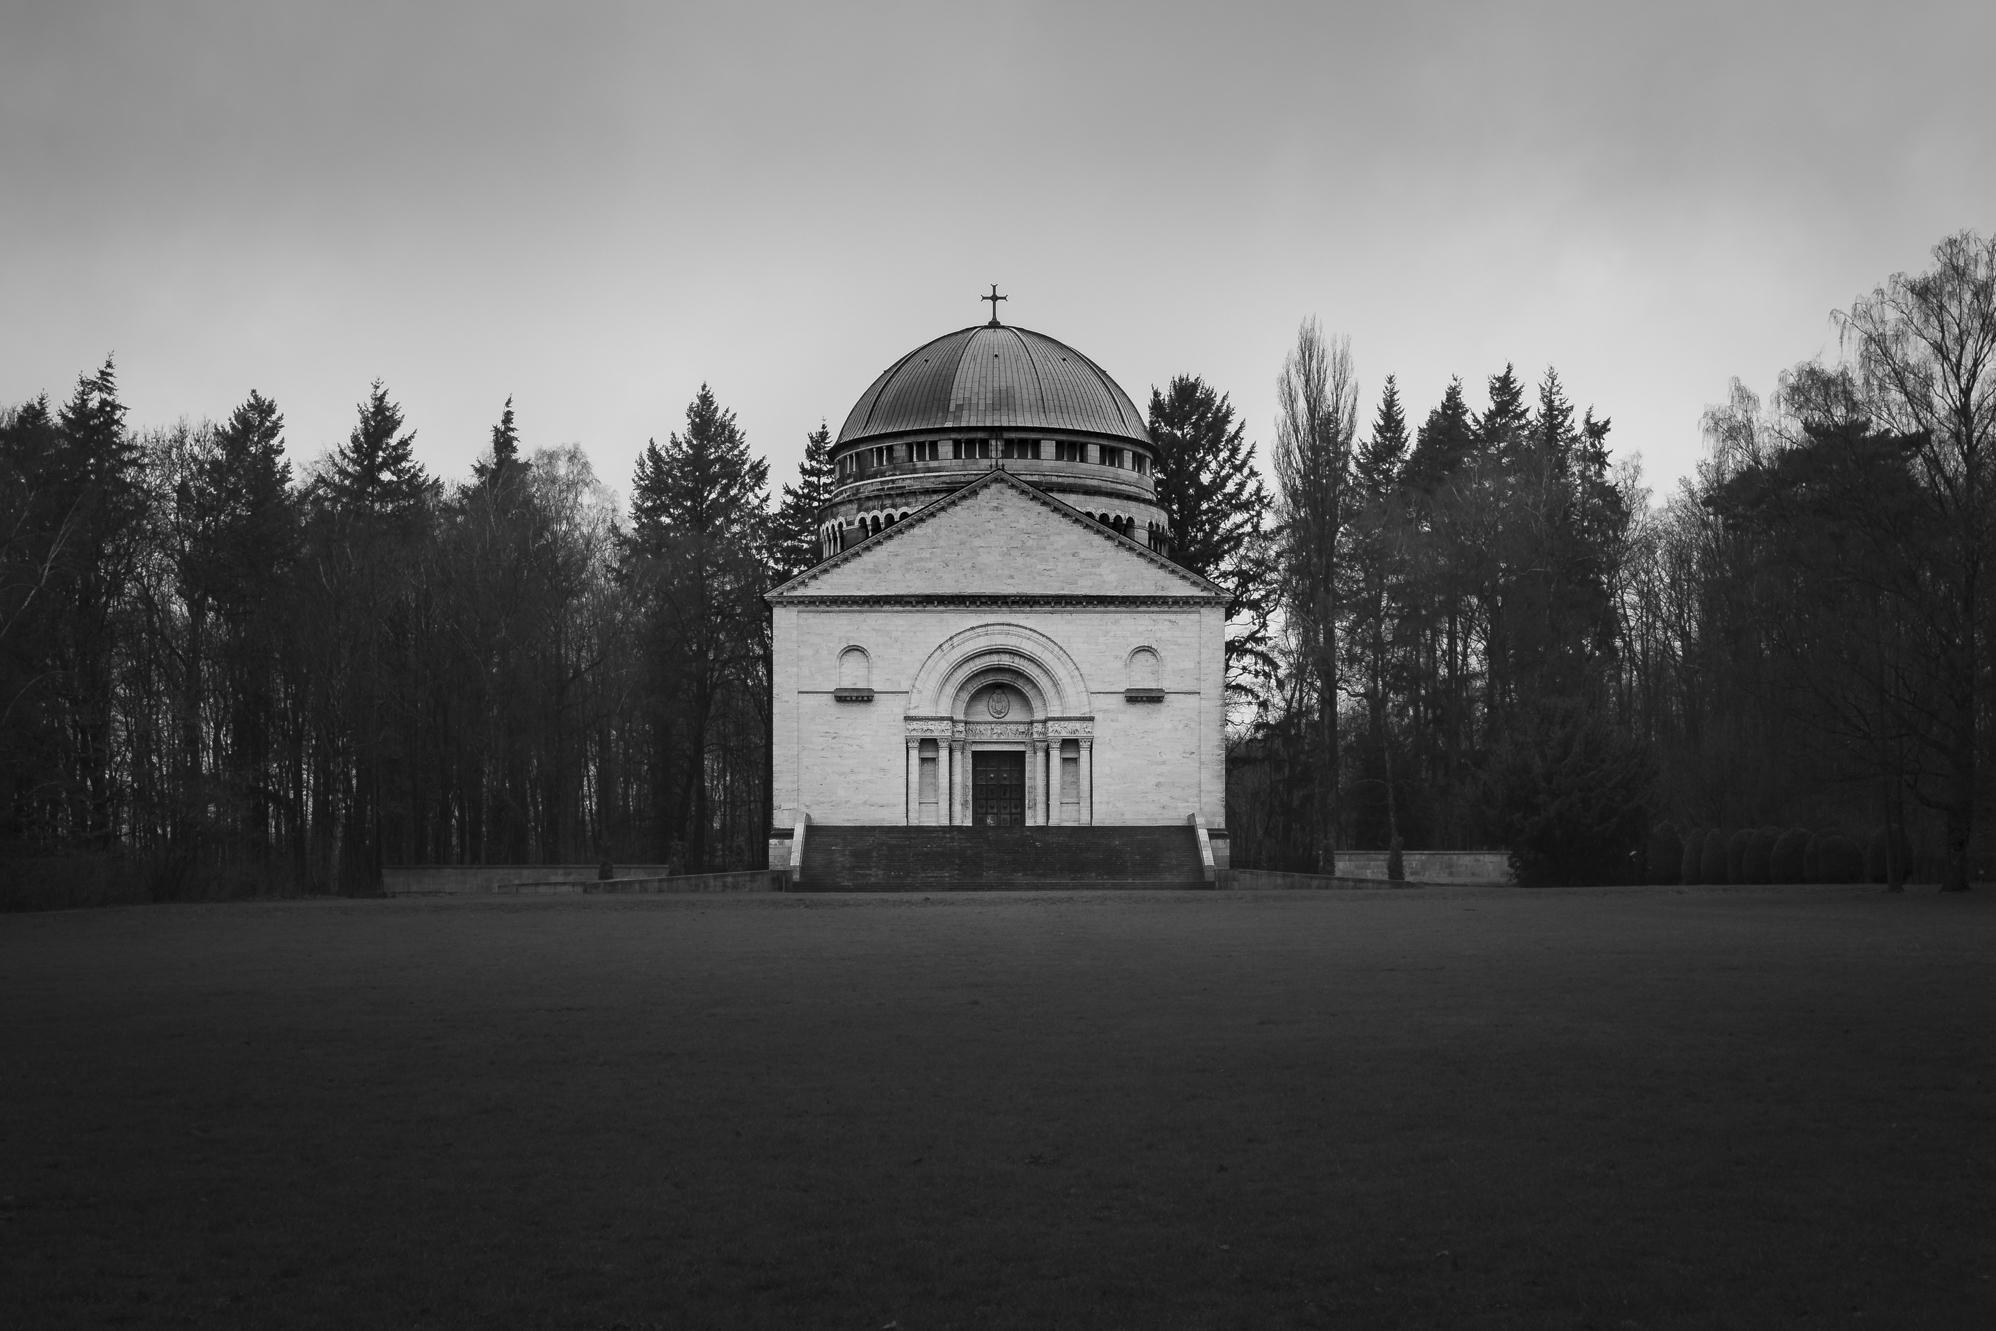 Mausoleum Bückeburg, Germany